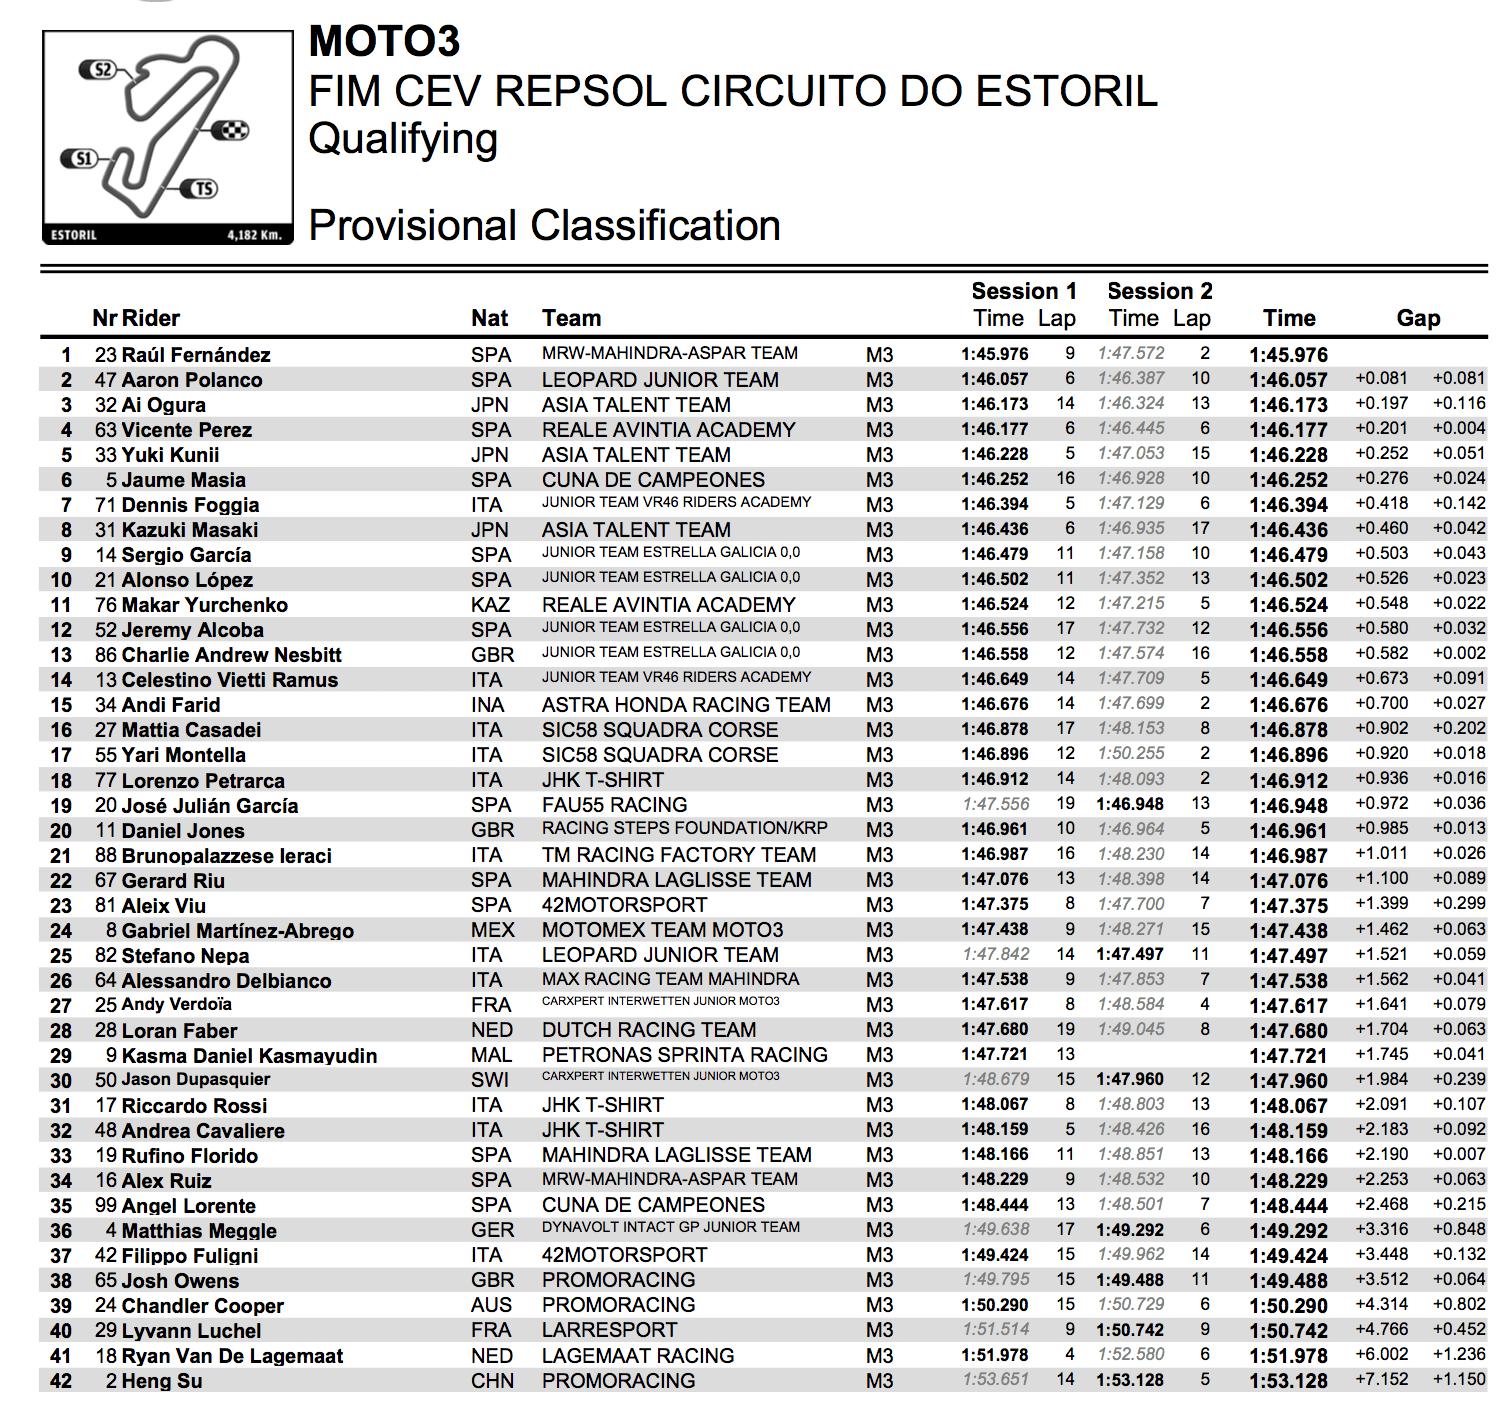 ★CEV Repsol 2017エストリル戦 Moto3クラス予選総合結果